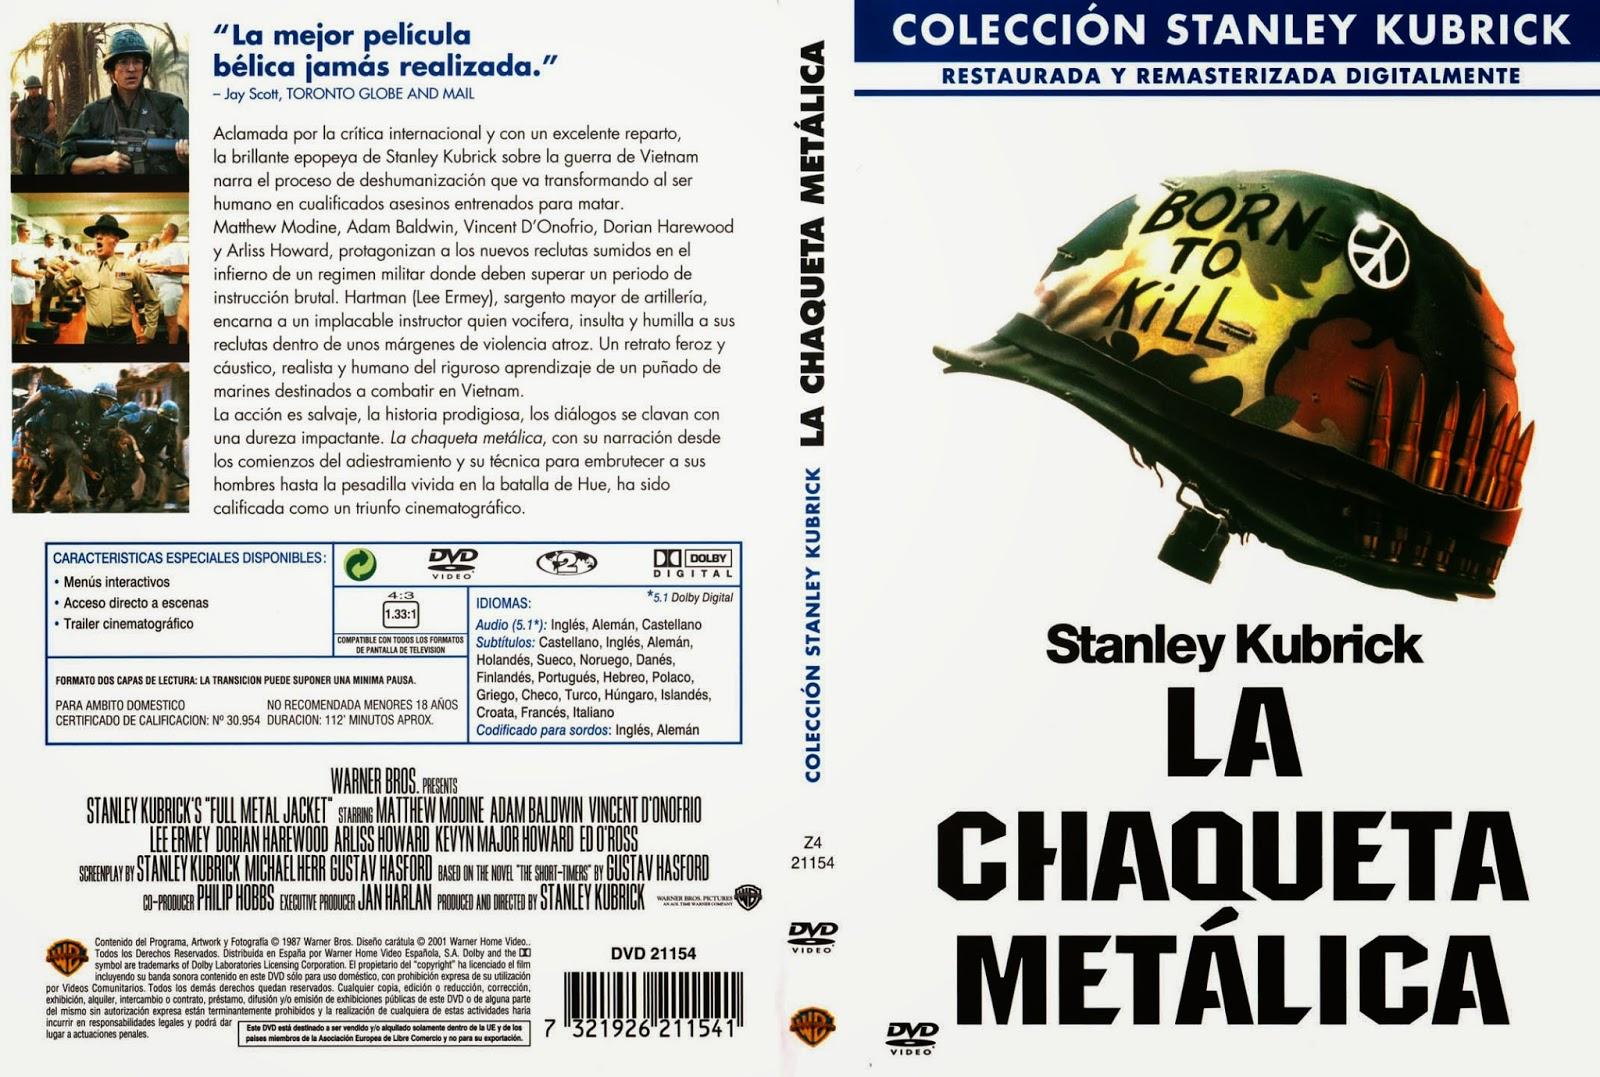 La Chaqueta Metalica DVD